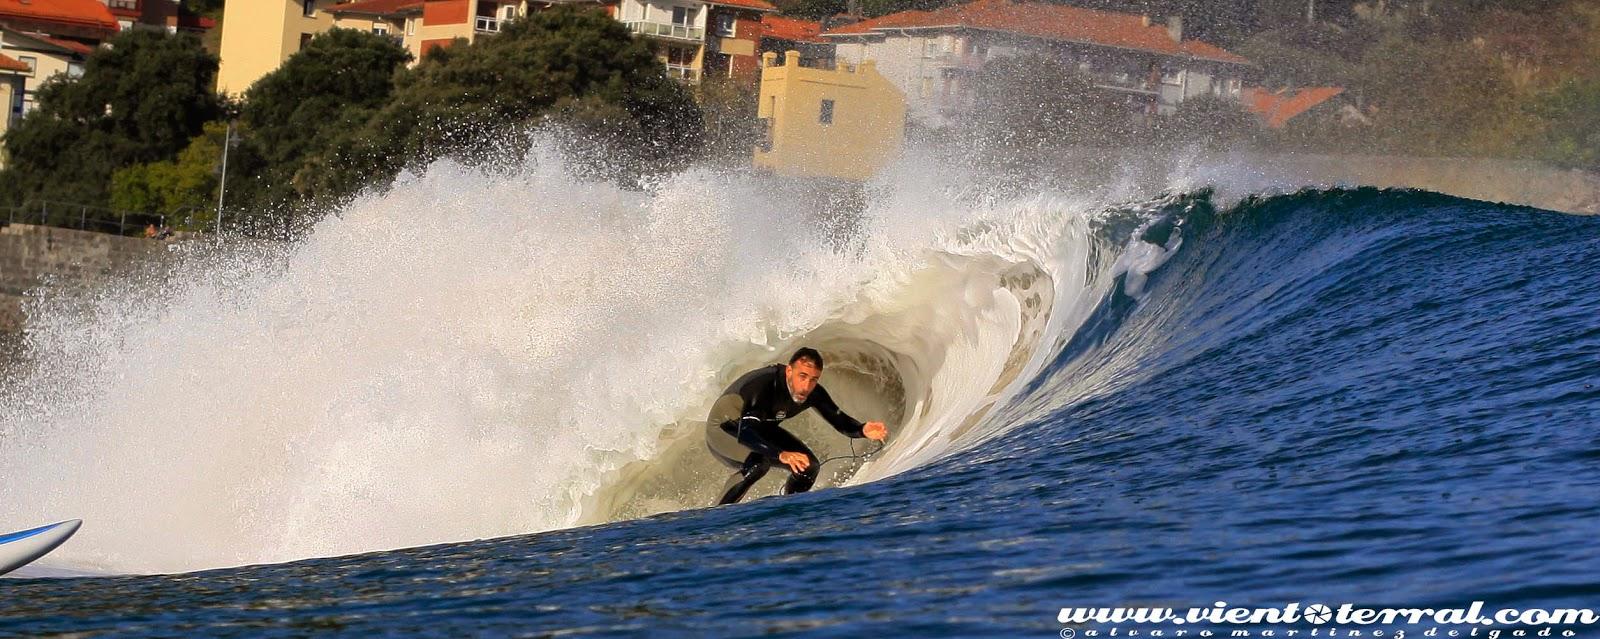 sesion mundaka octubre viento terral surf %2B(9)